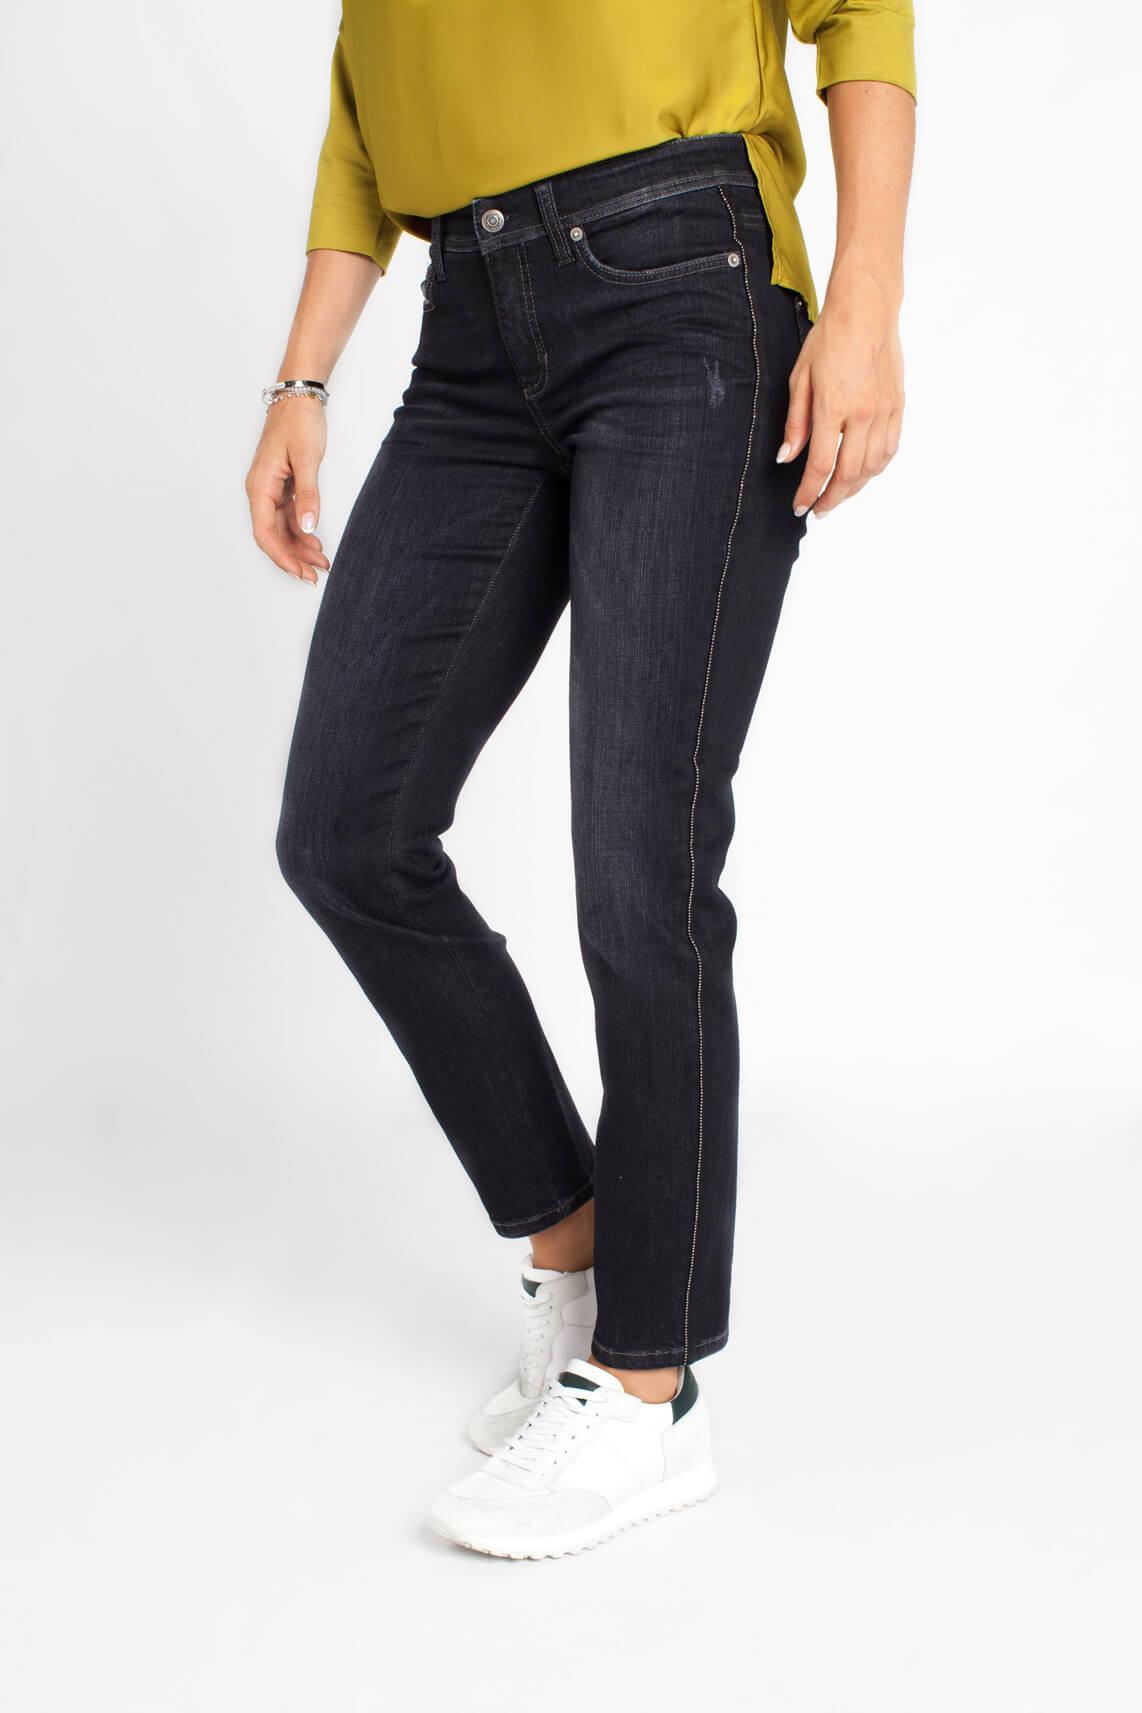 Cambio Dames Parla jeans met kettinkje Blauw